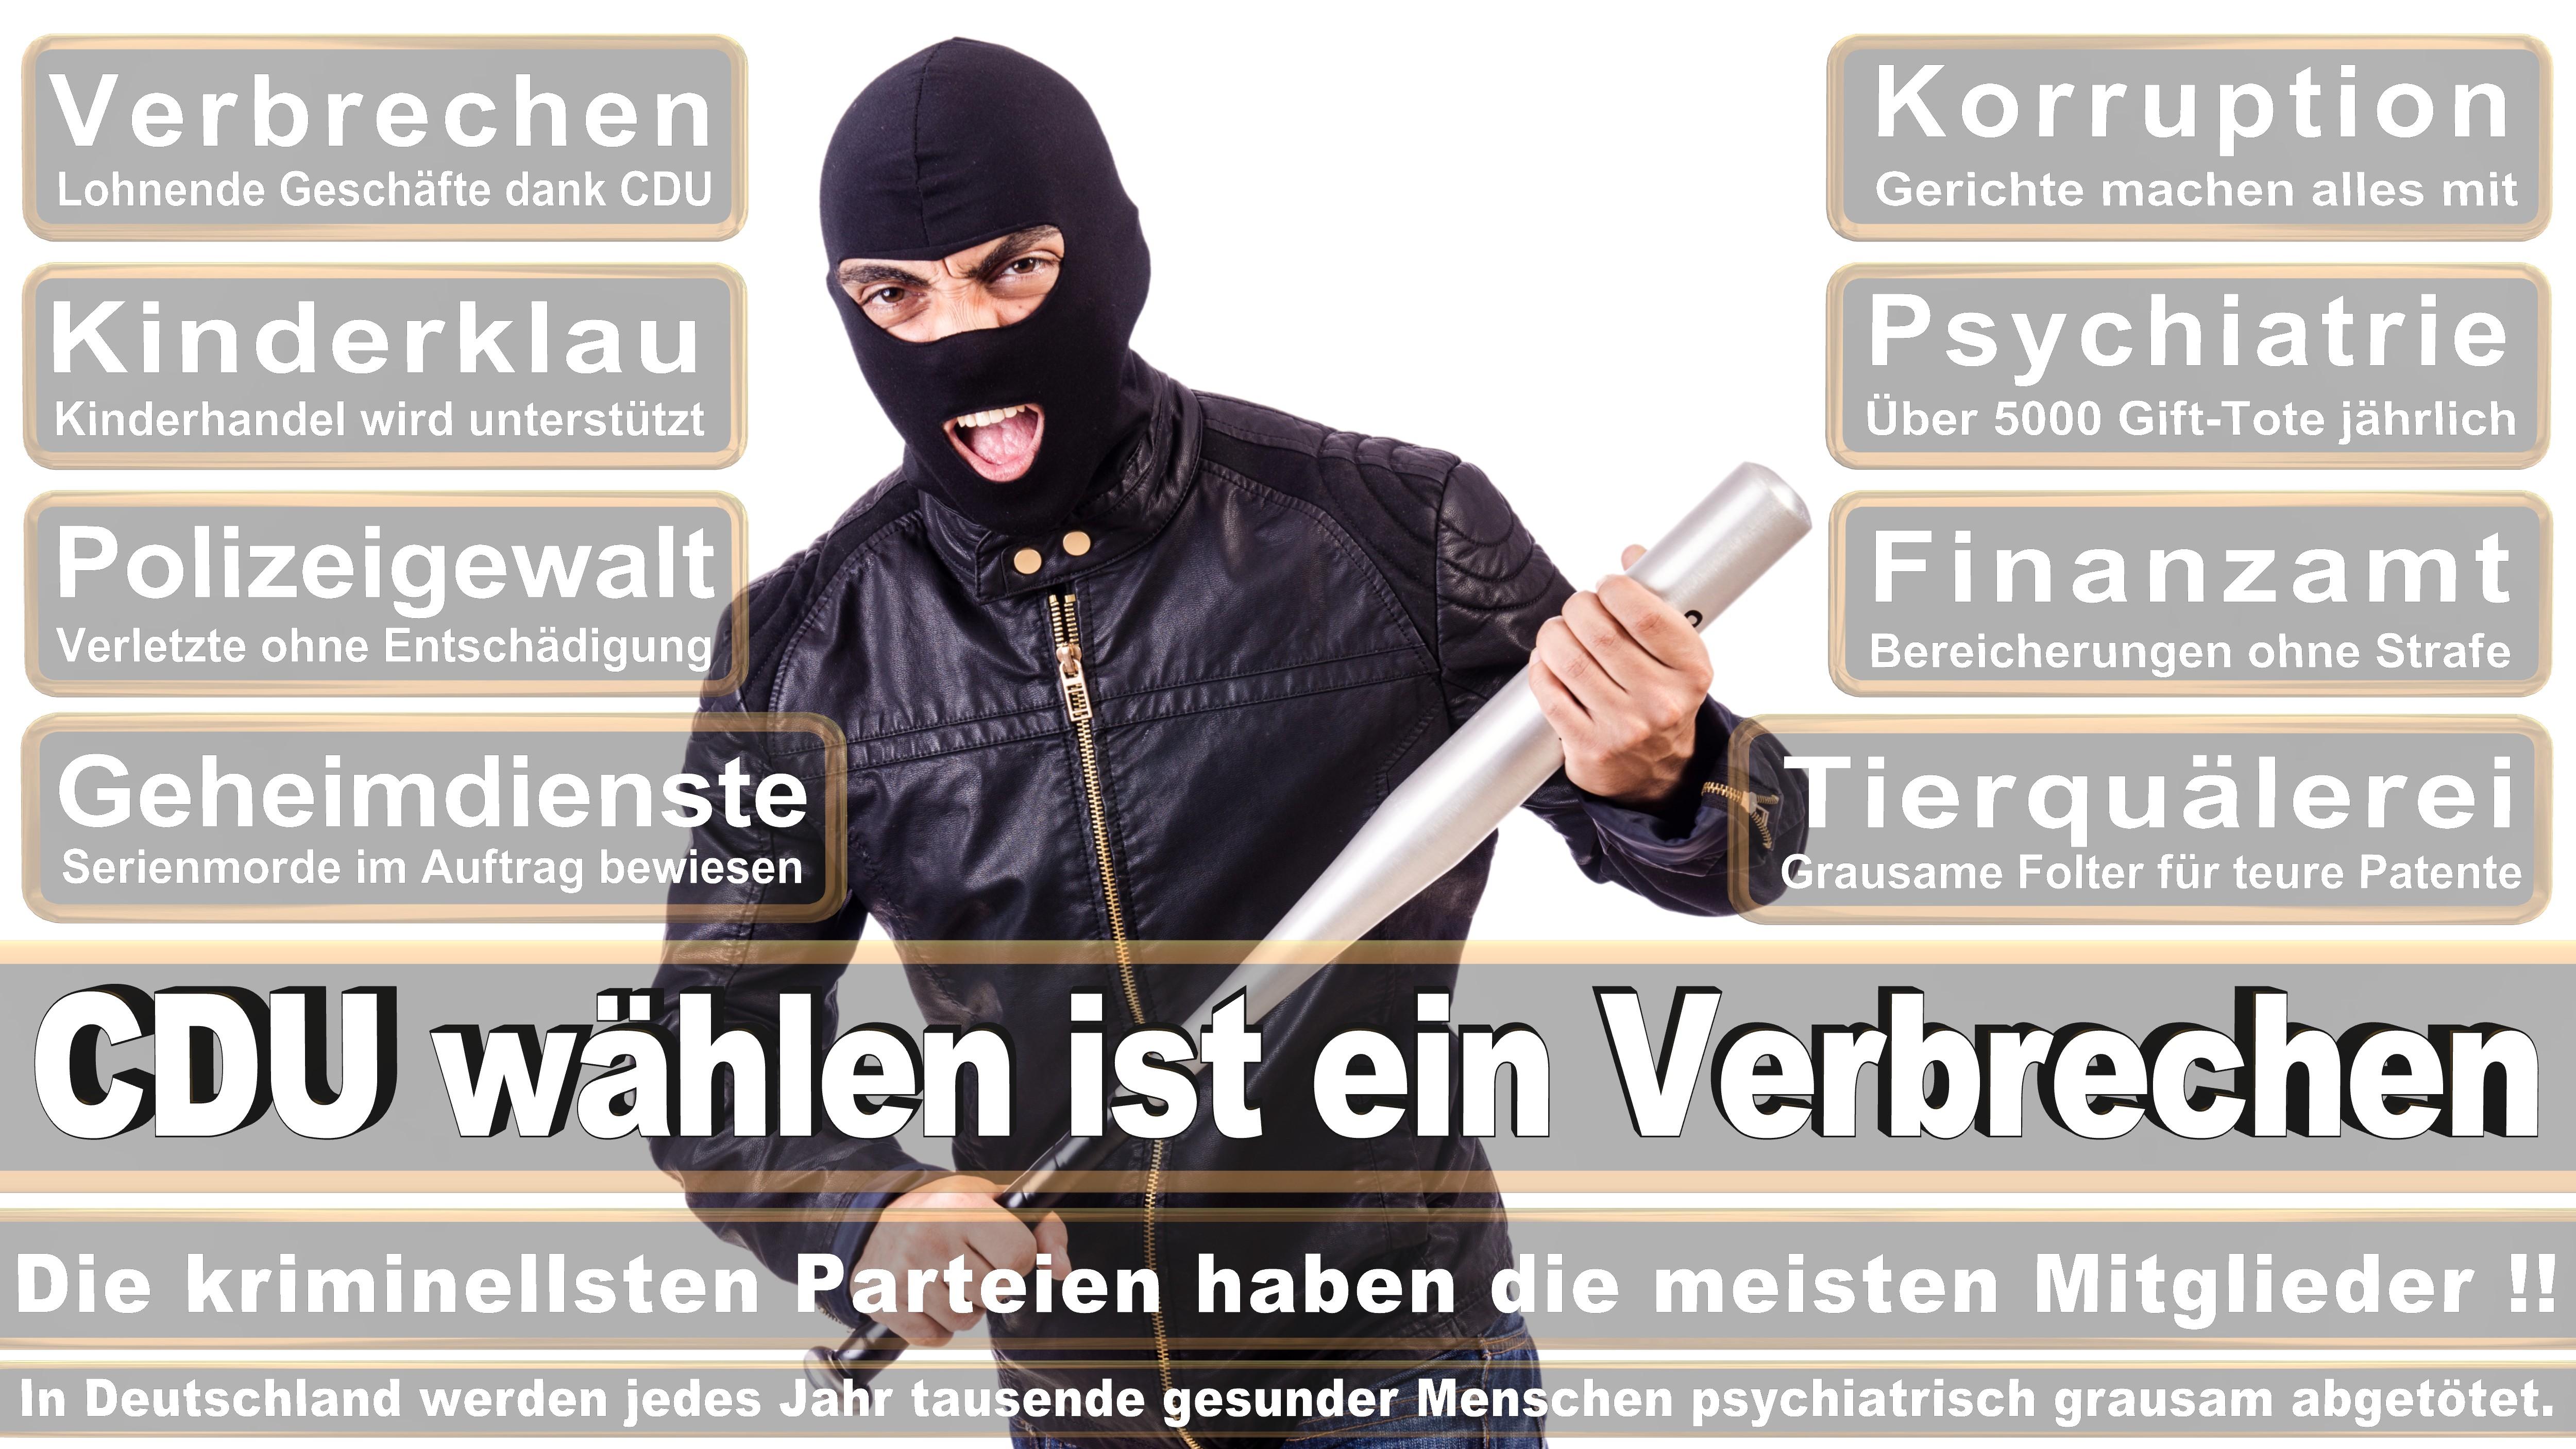 Edelgard Bulmahn SPD Niedersachsen Stadt Hannover II Politiker Deutschland